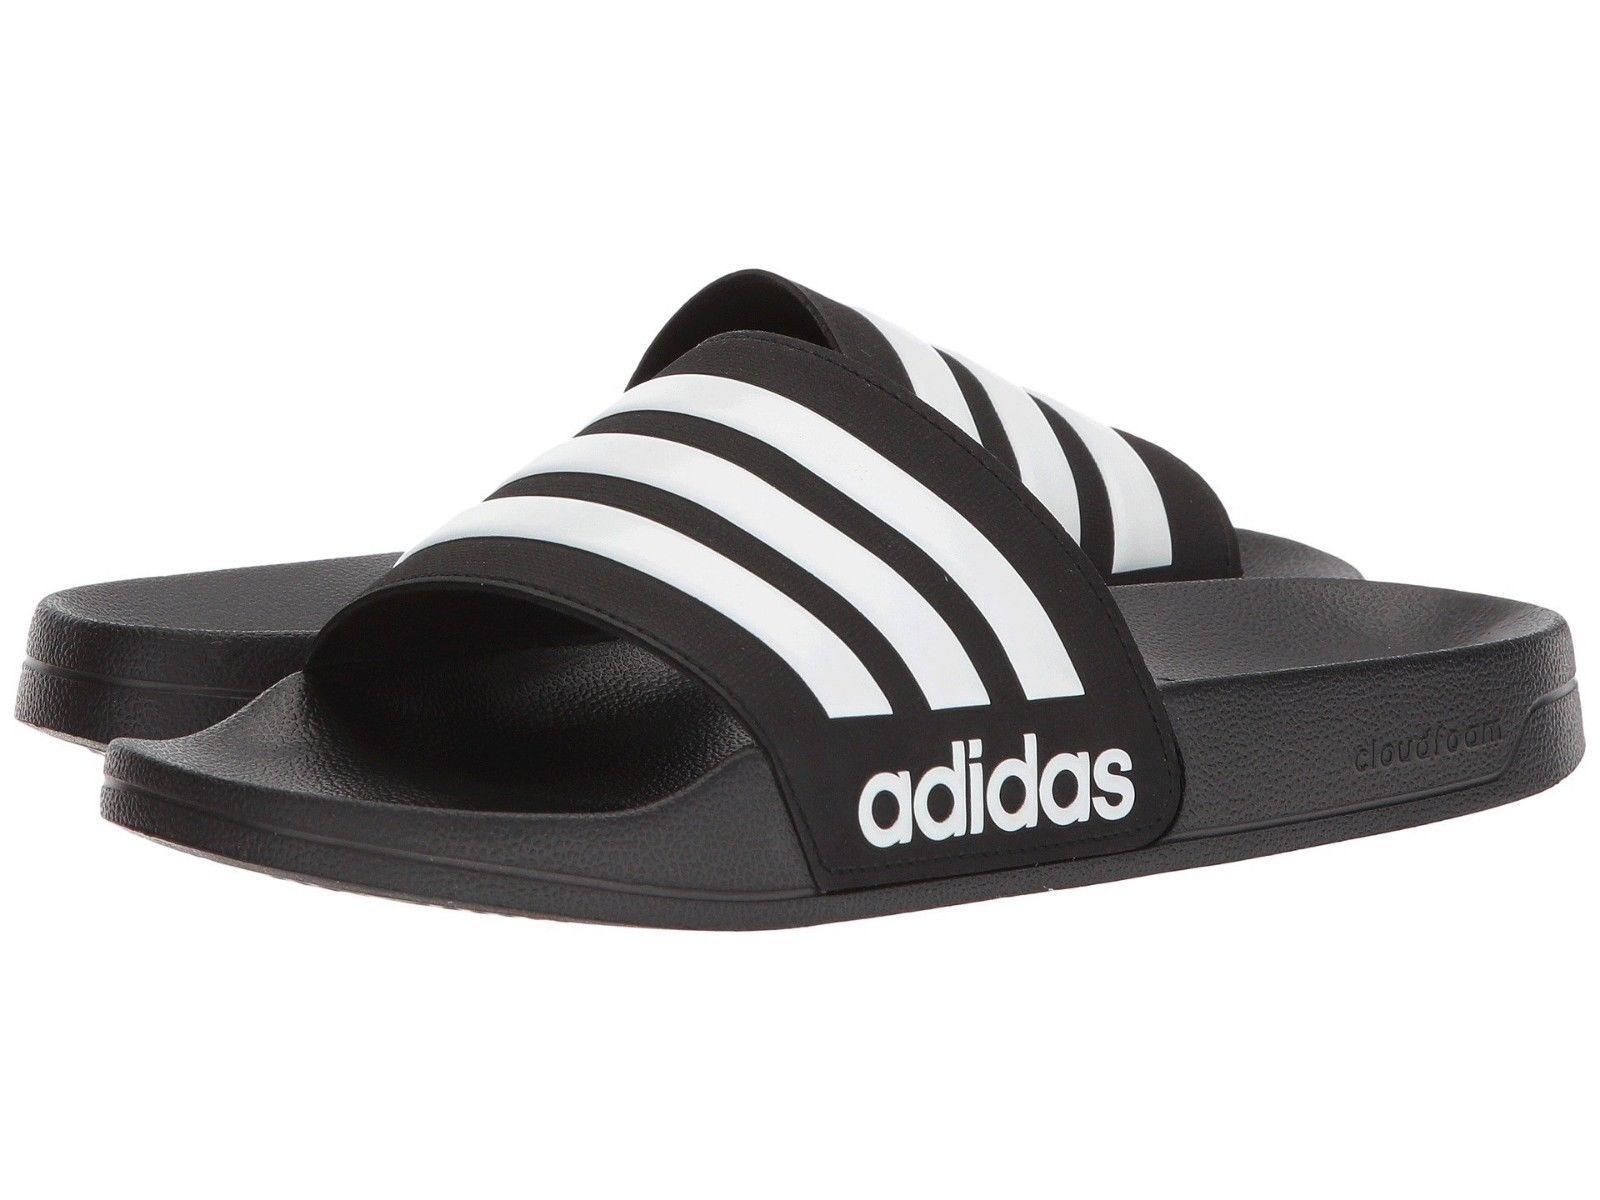 Adidas Men's NEO CF Adilette Slide Sandal AQ1701 Black White Core Black New